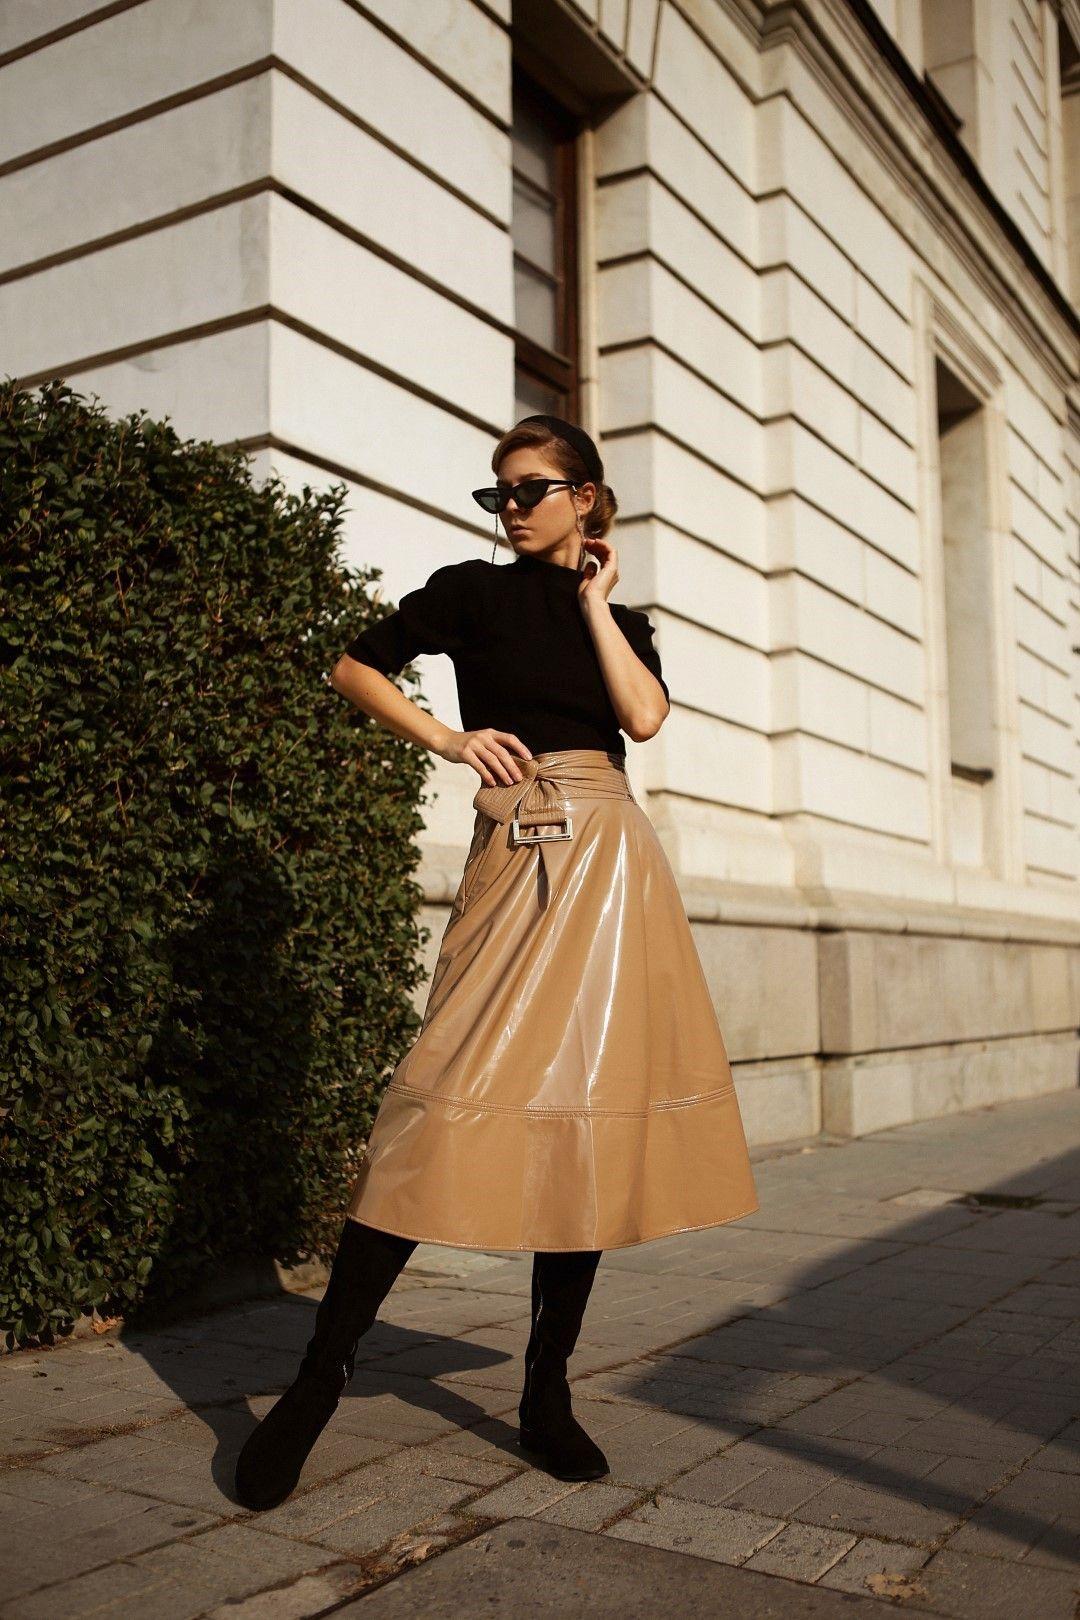 Блуза Molly Bracken, пола Nenette ботуши Calvin Klein от магазини Collective.